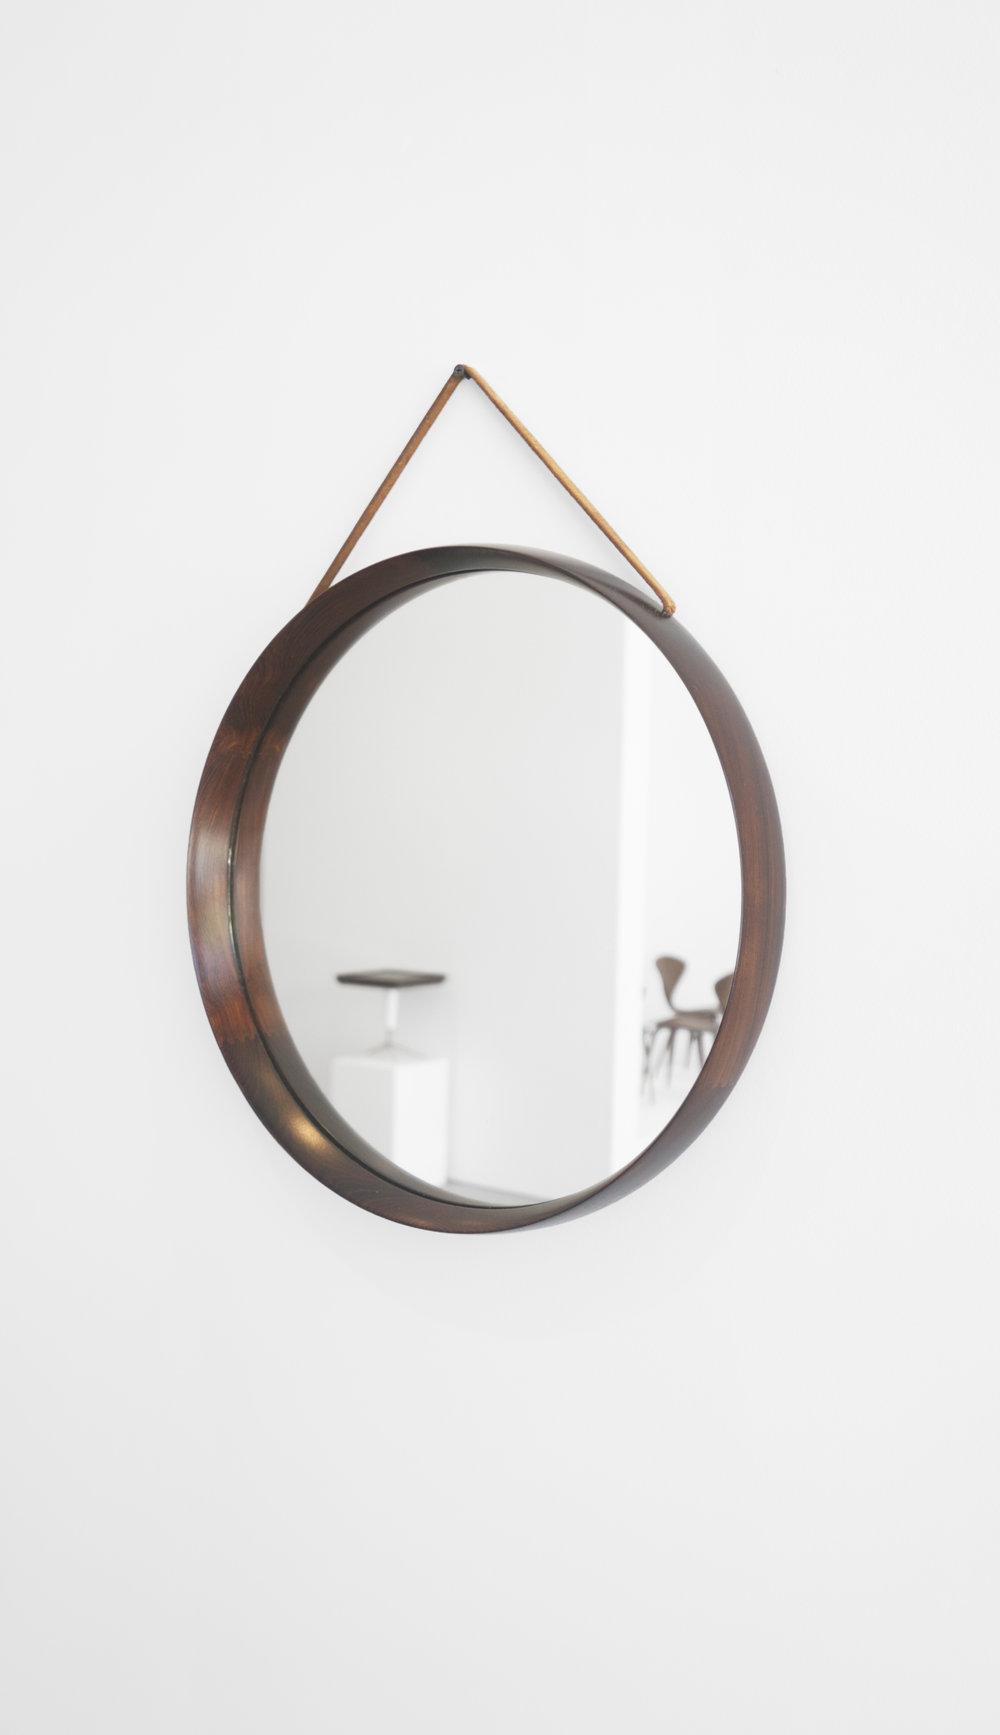 uno and osten kristiansson  mirror  c. 1960 ...